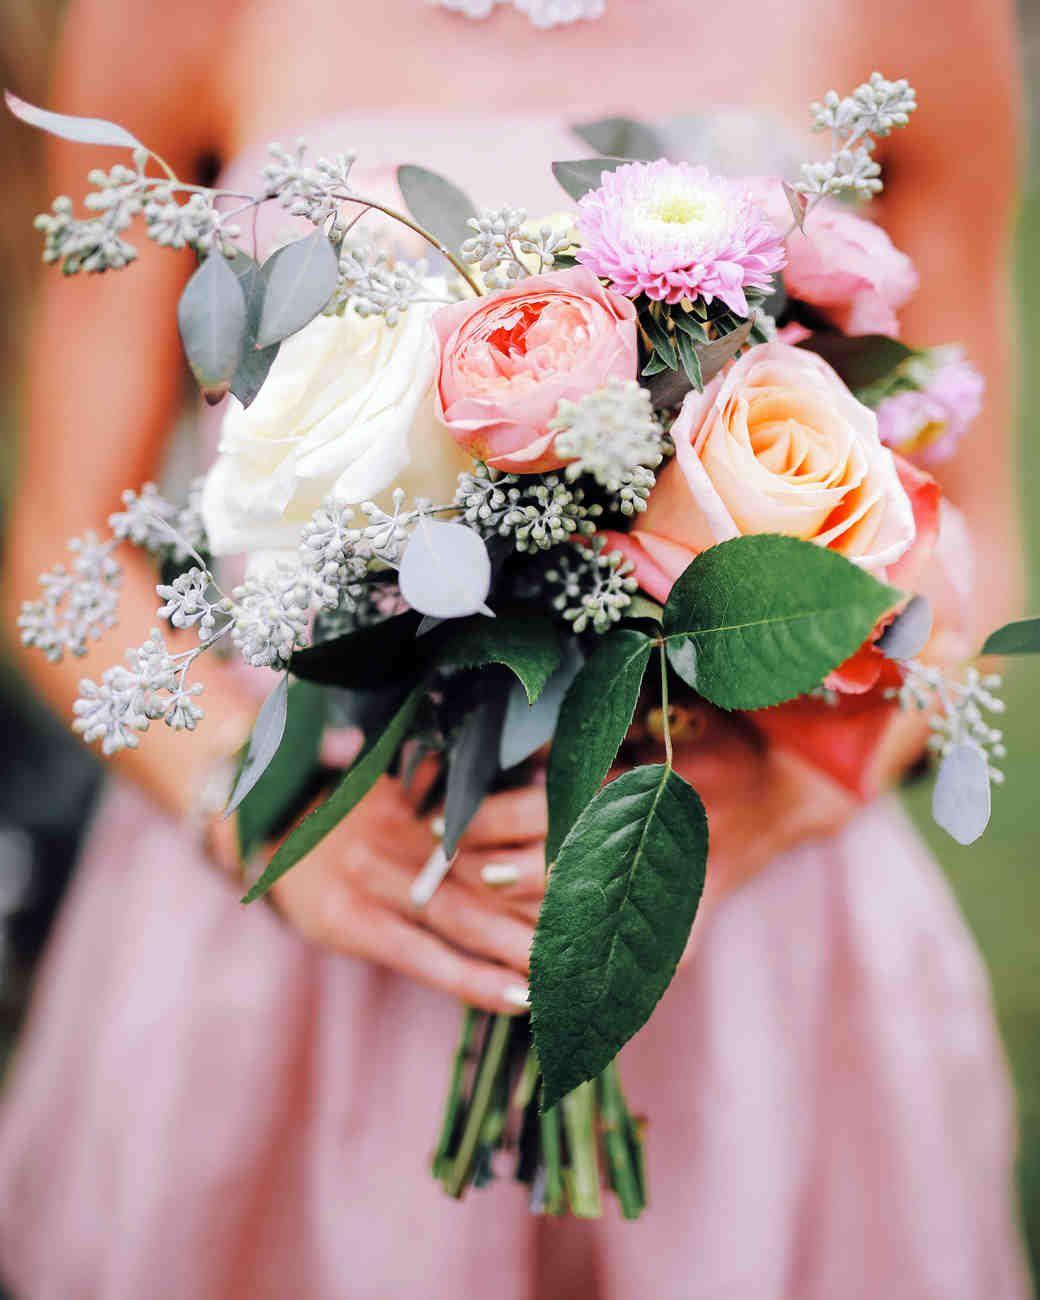 Browse this roundup of bridesmaid arrangements from classic browse this roundup of bridesmaid arrangements from classic clutches to non floral posies izmirmasajfo